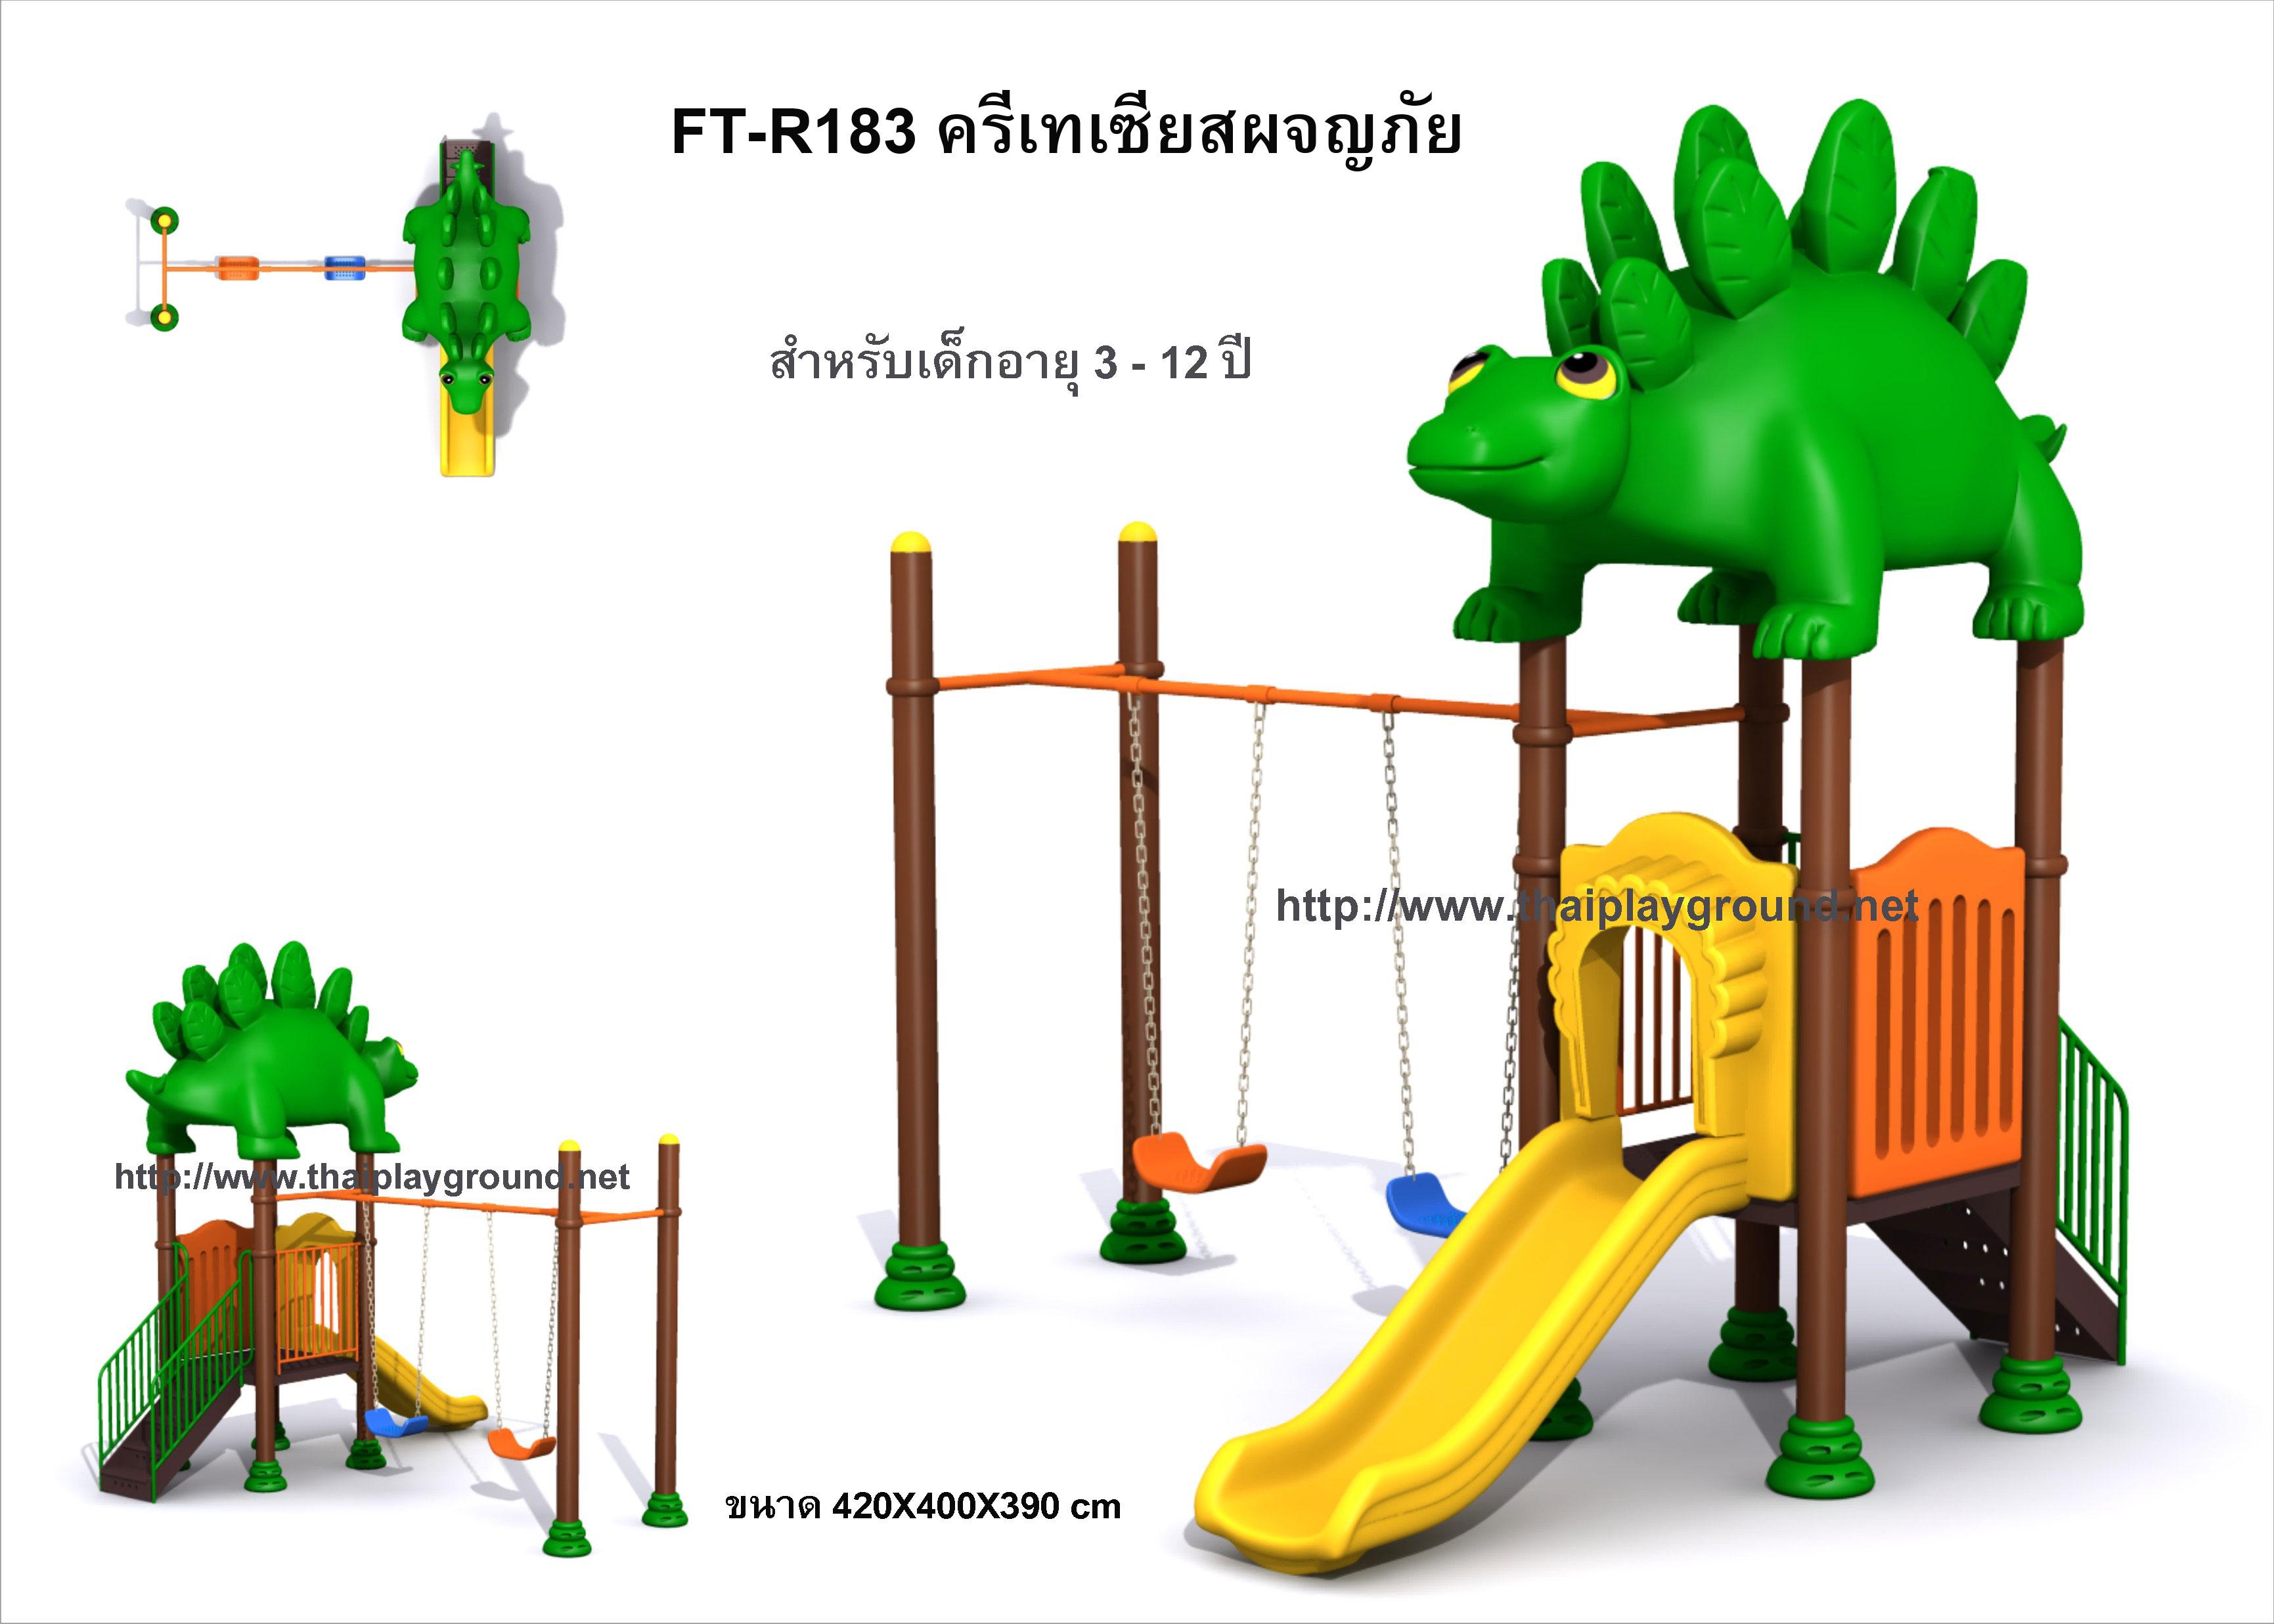 FT-R183 ครีเทเซียสผจญภัย